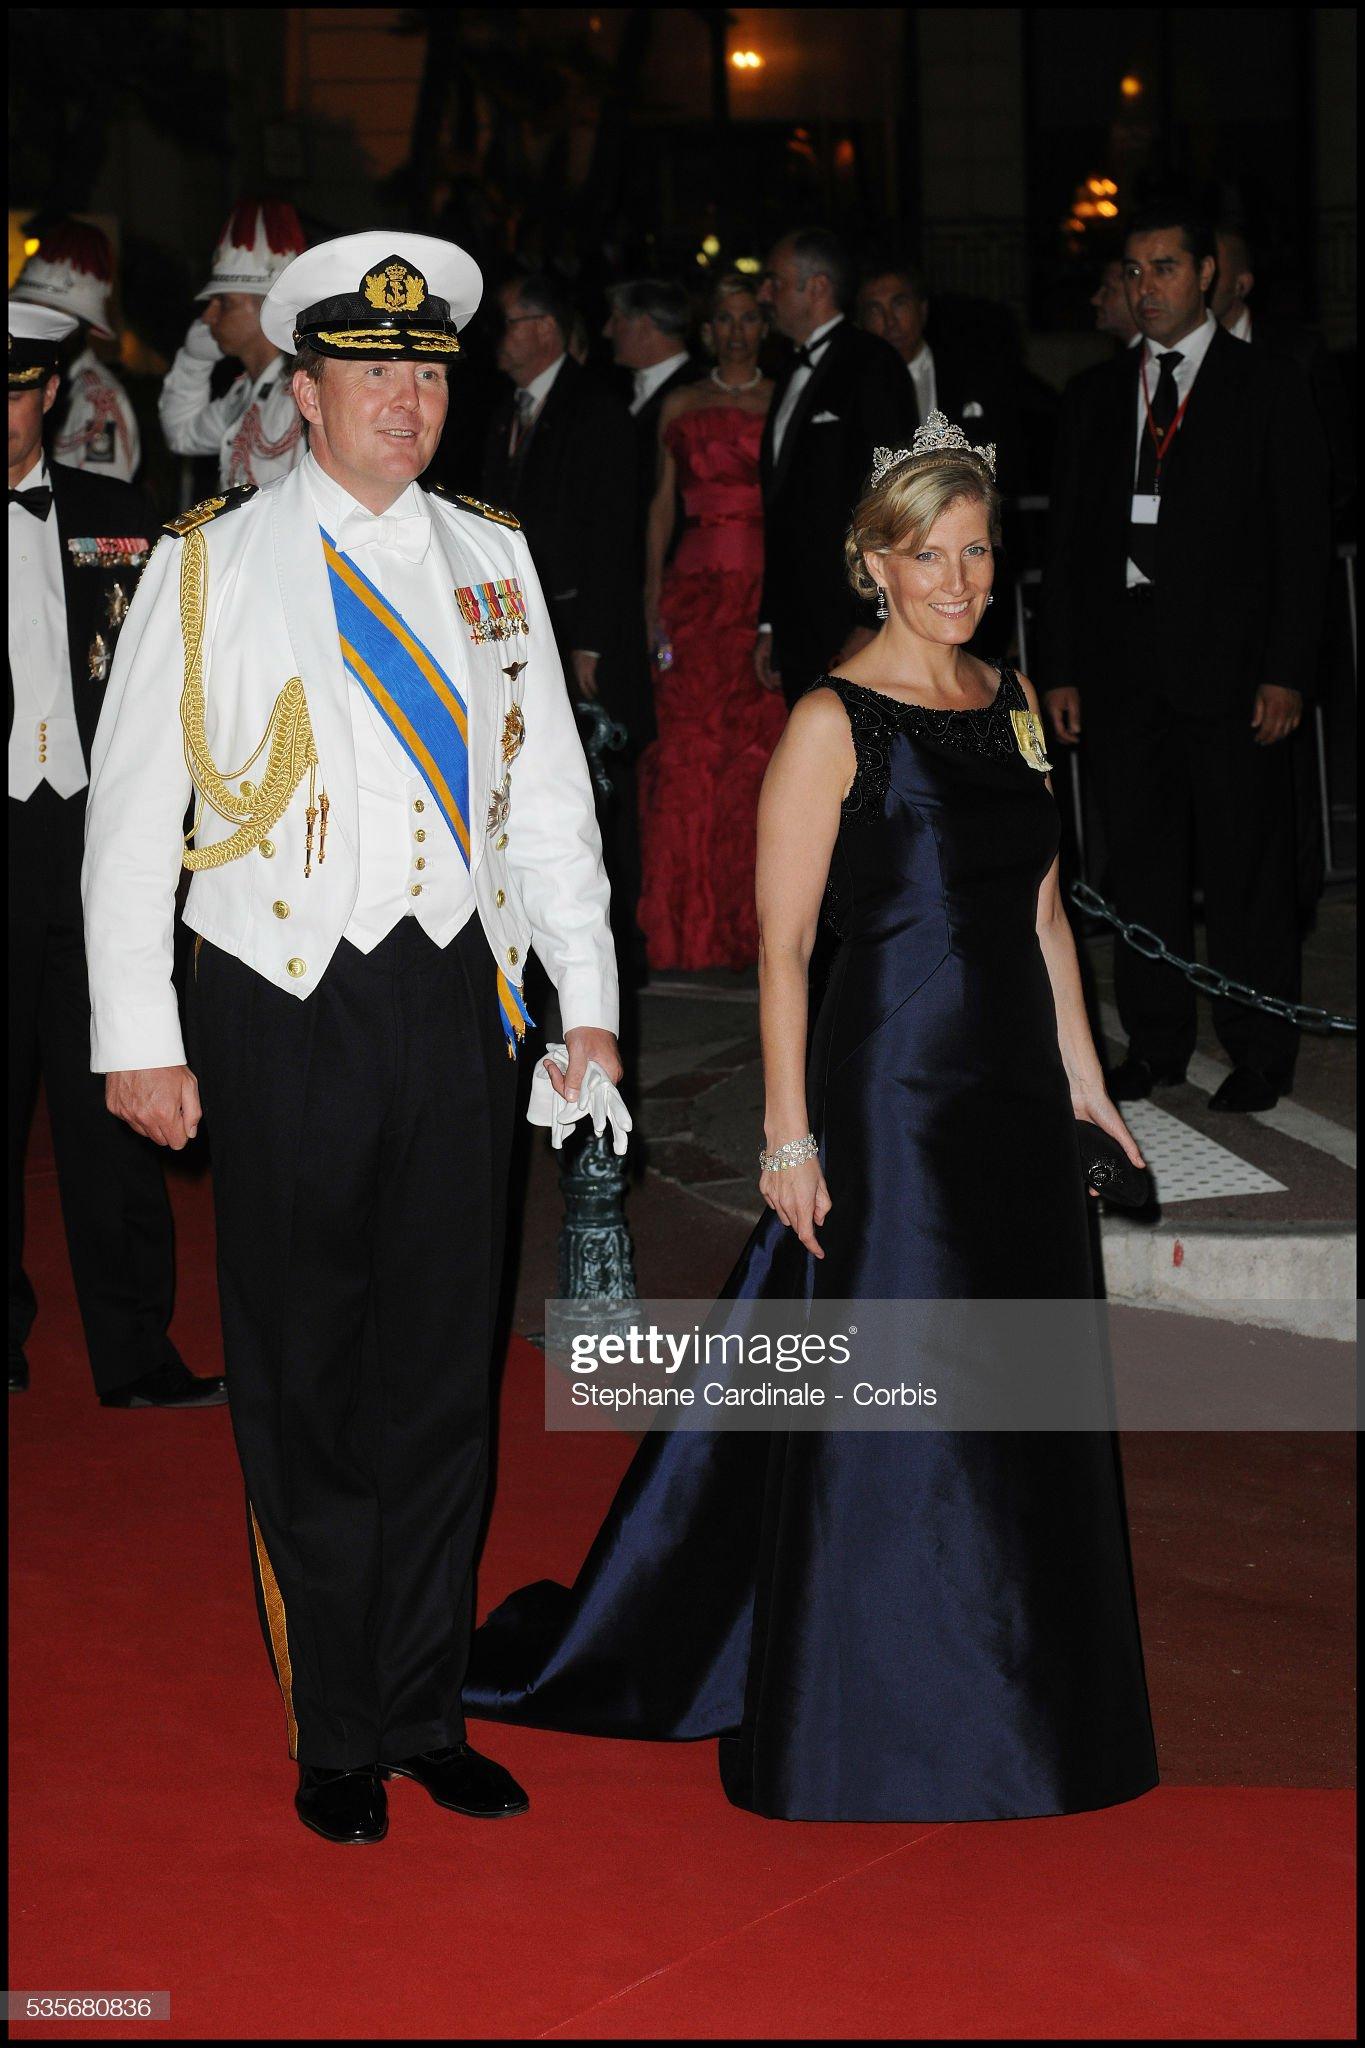 Monaco - Monaco Royal Wedding - Dinner : News Photo